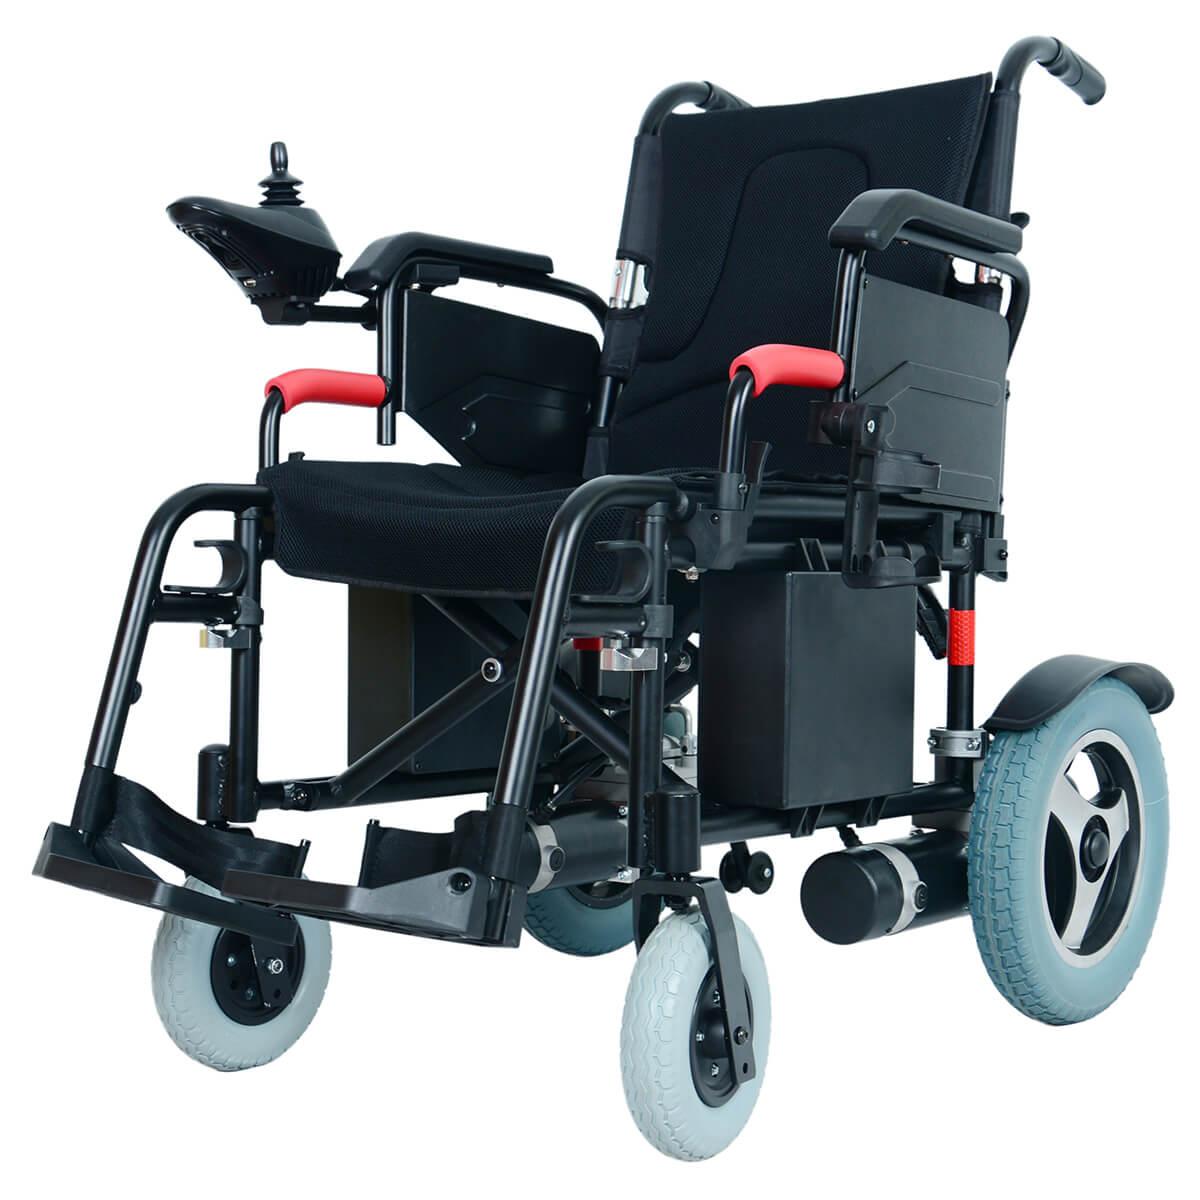 Yattll foldable electric wheelchair power wheelchair motorized wheelchair